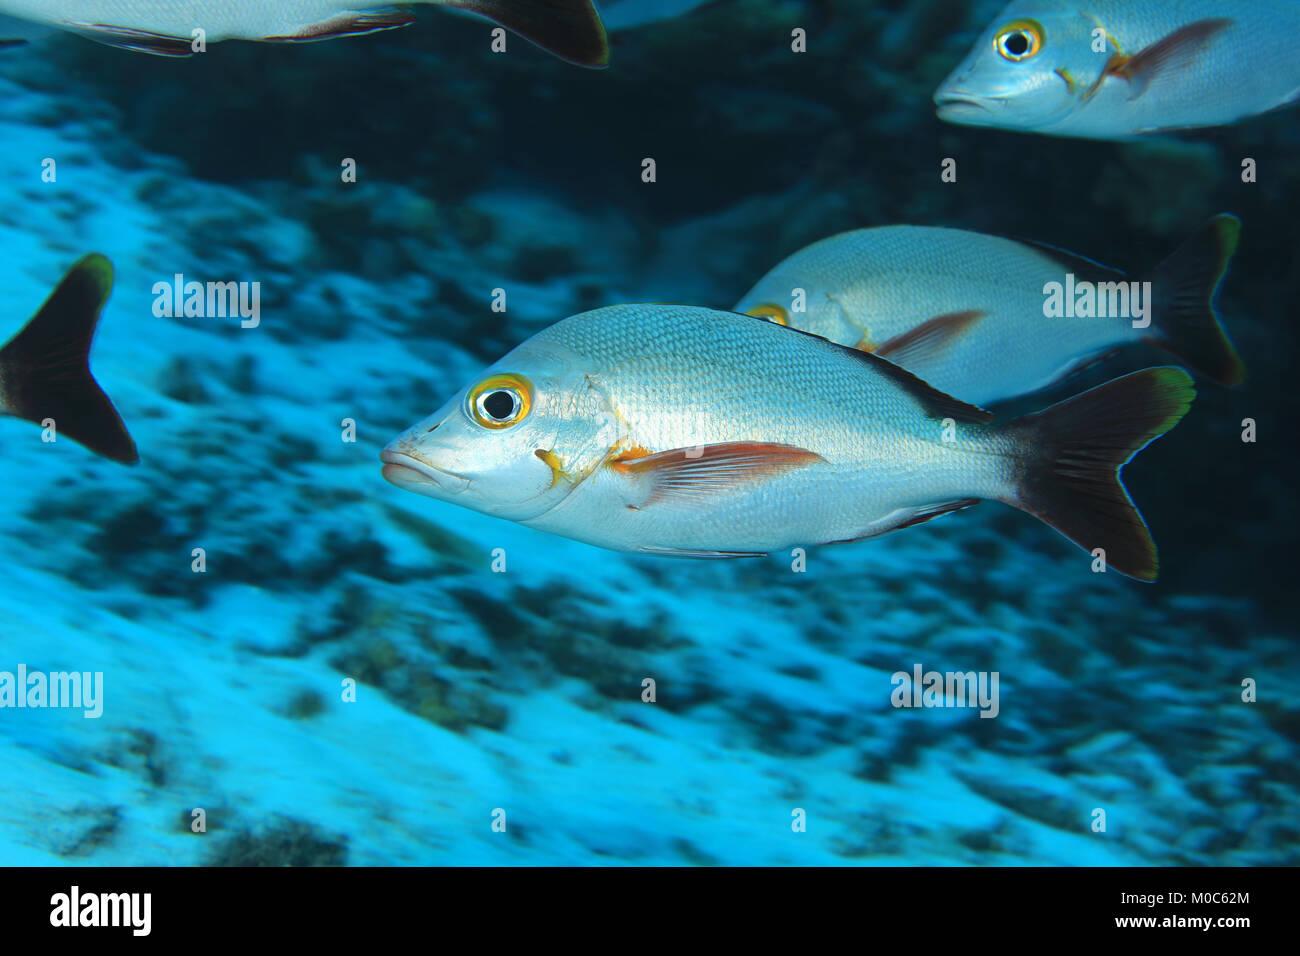 Humpback red snapper fish (Lutjanus gibbus) underwater in the Maldives - Stock Image